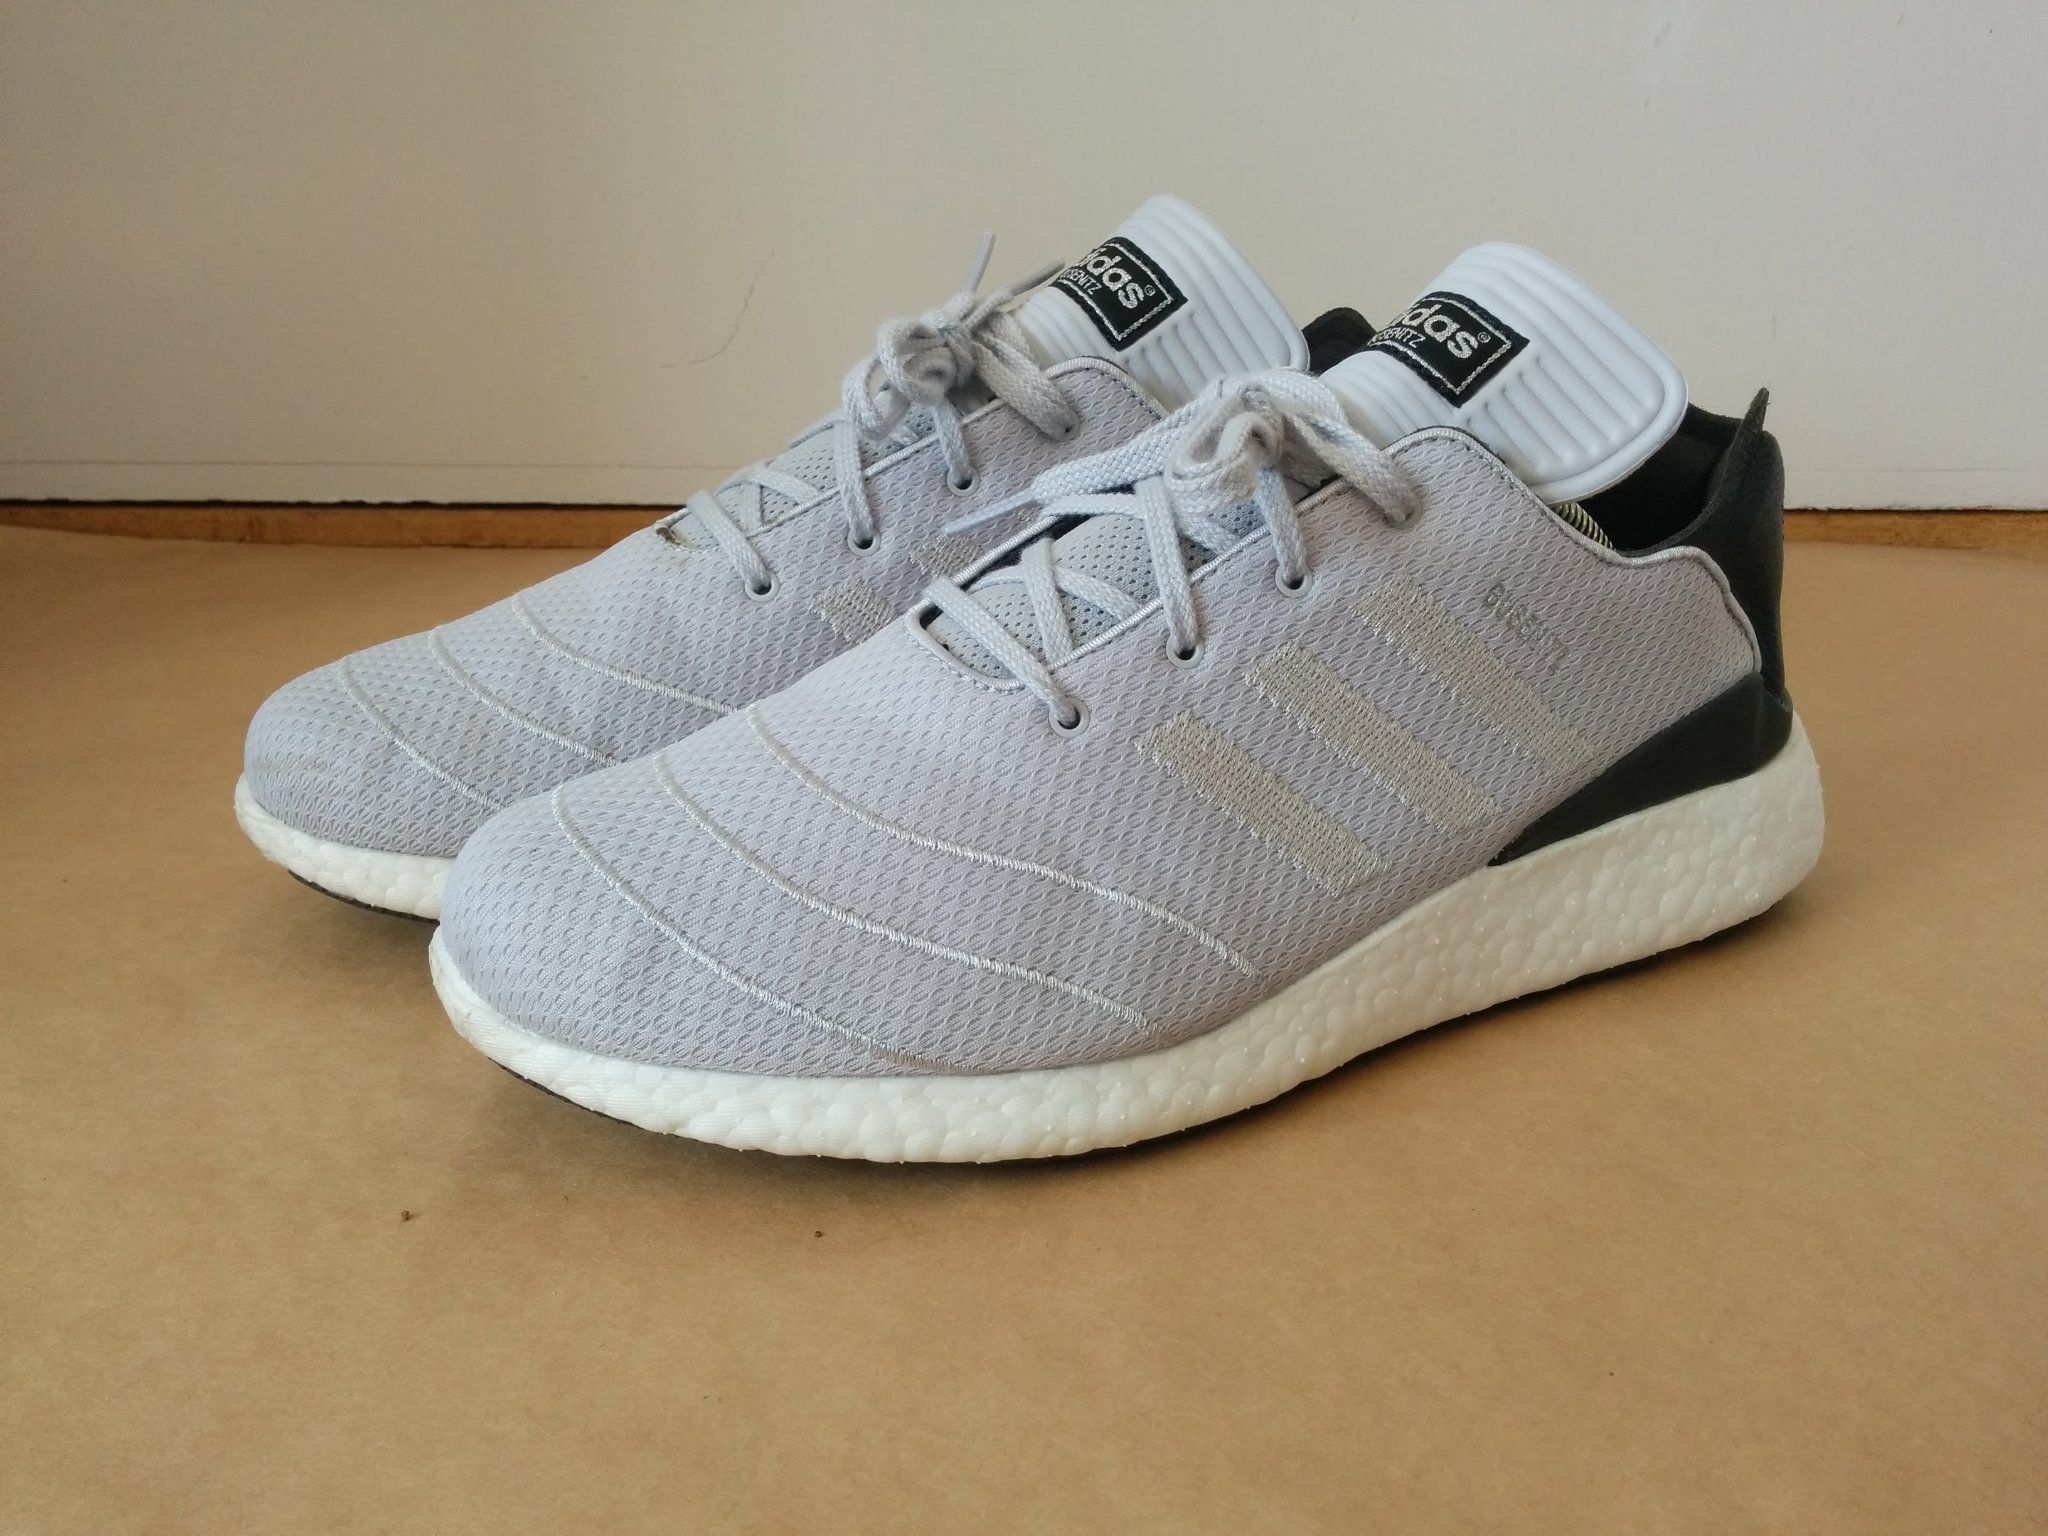 Adidas Busenitz Pure Boost (storlek 44) (372415097) �?Köp